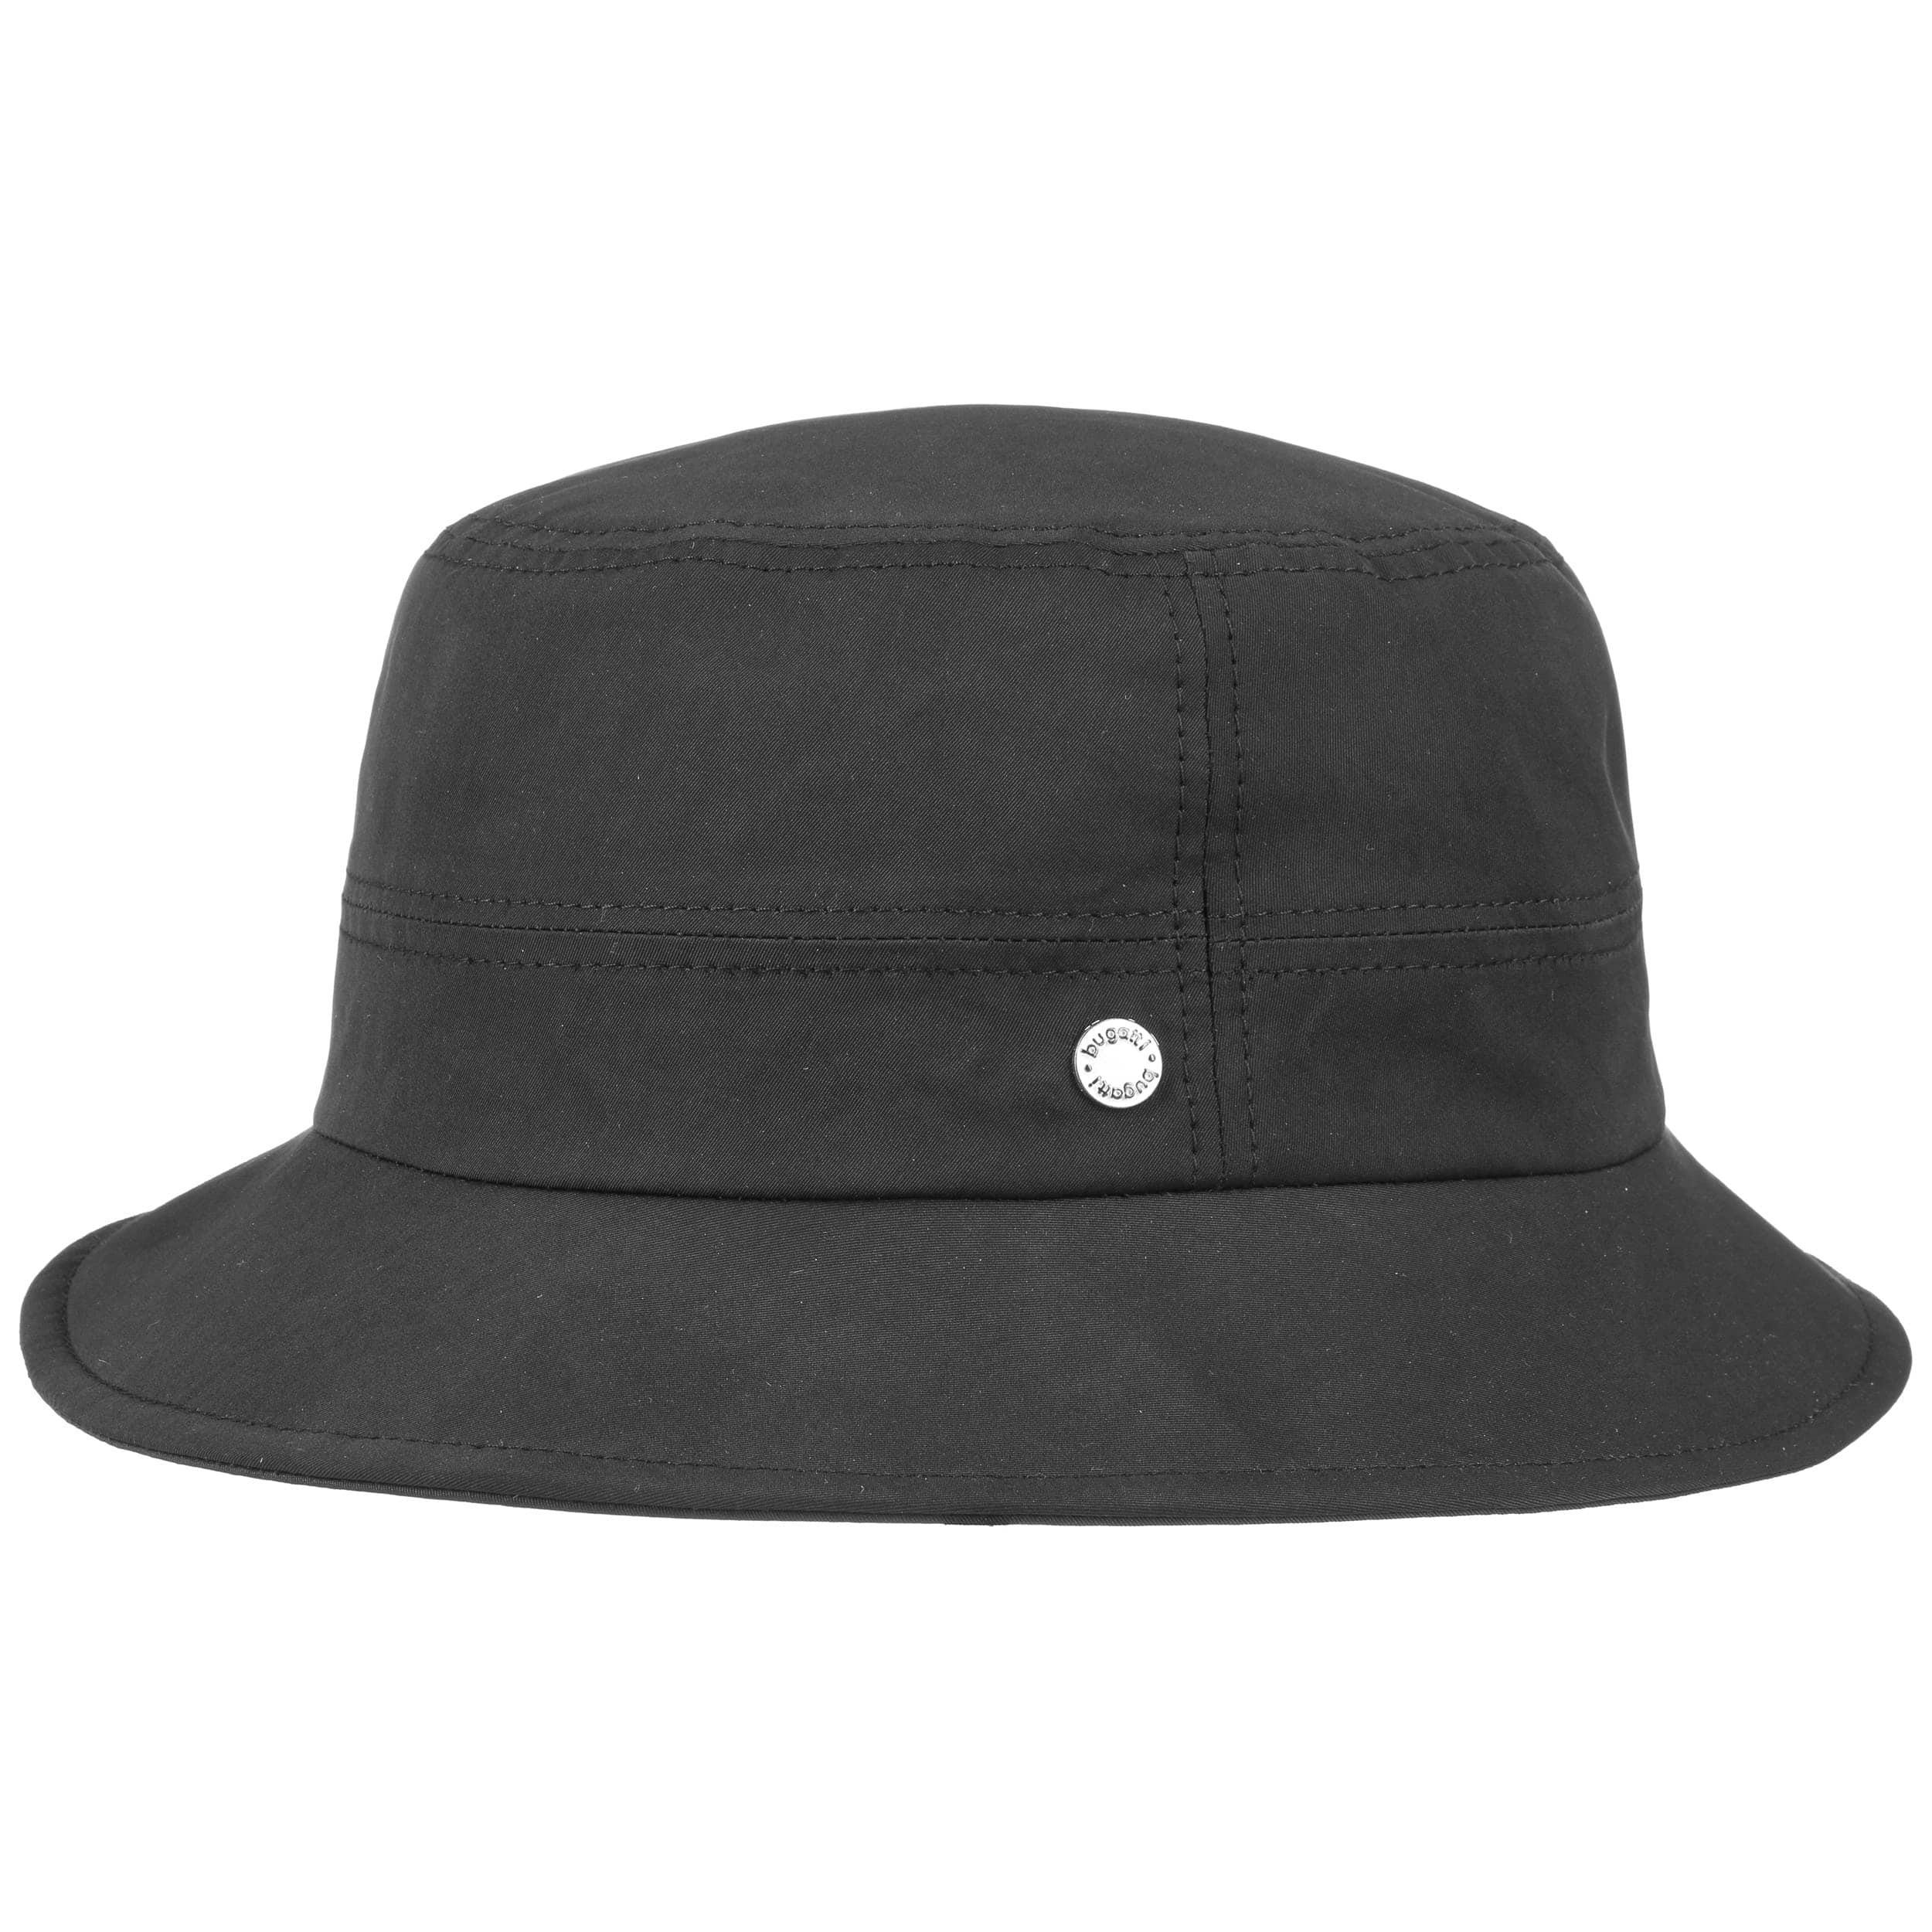 Gore Tex Bucket Rain Hat By Bugatti Gbp 64 95 Gt Hats